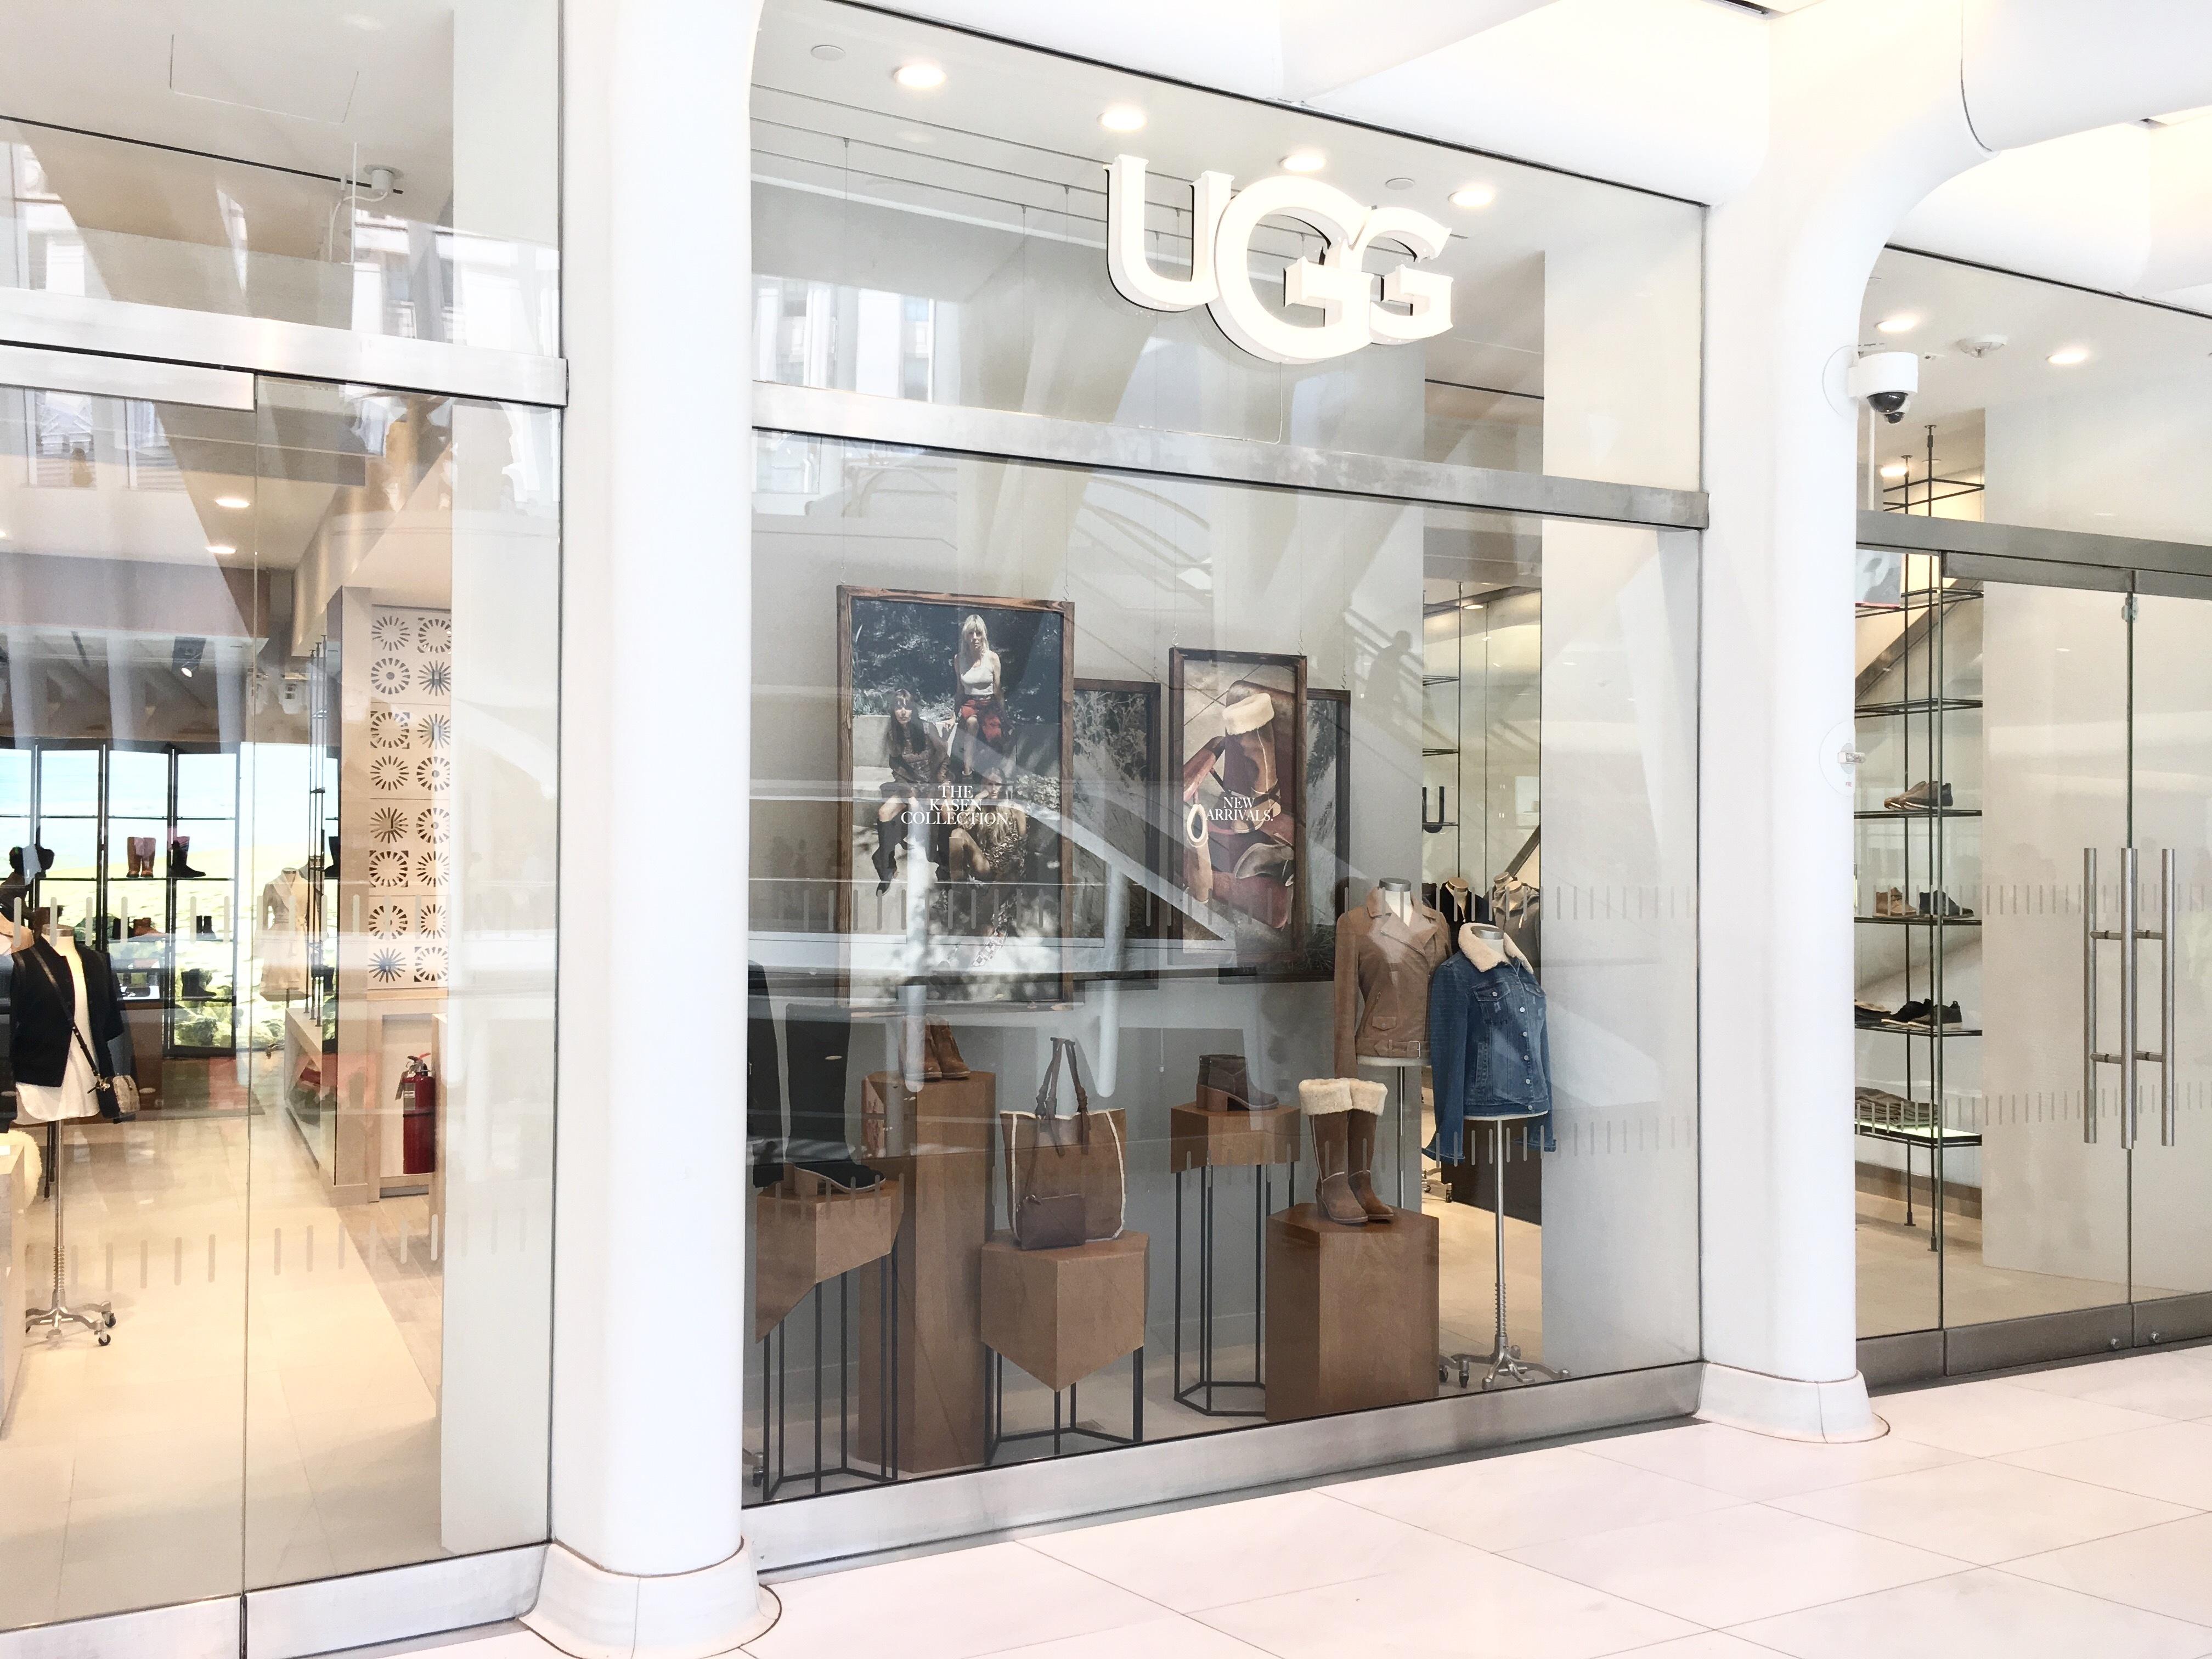 ugg store world trade center